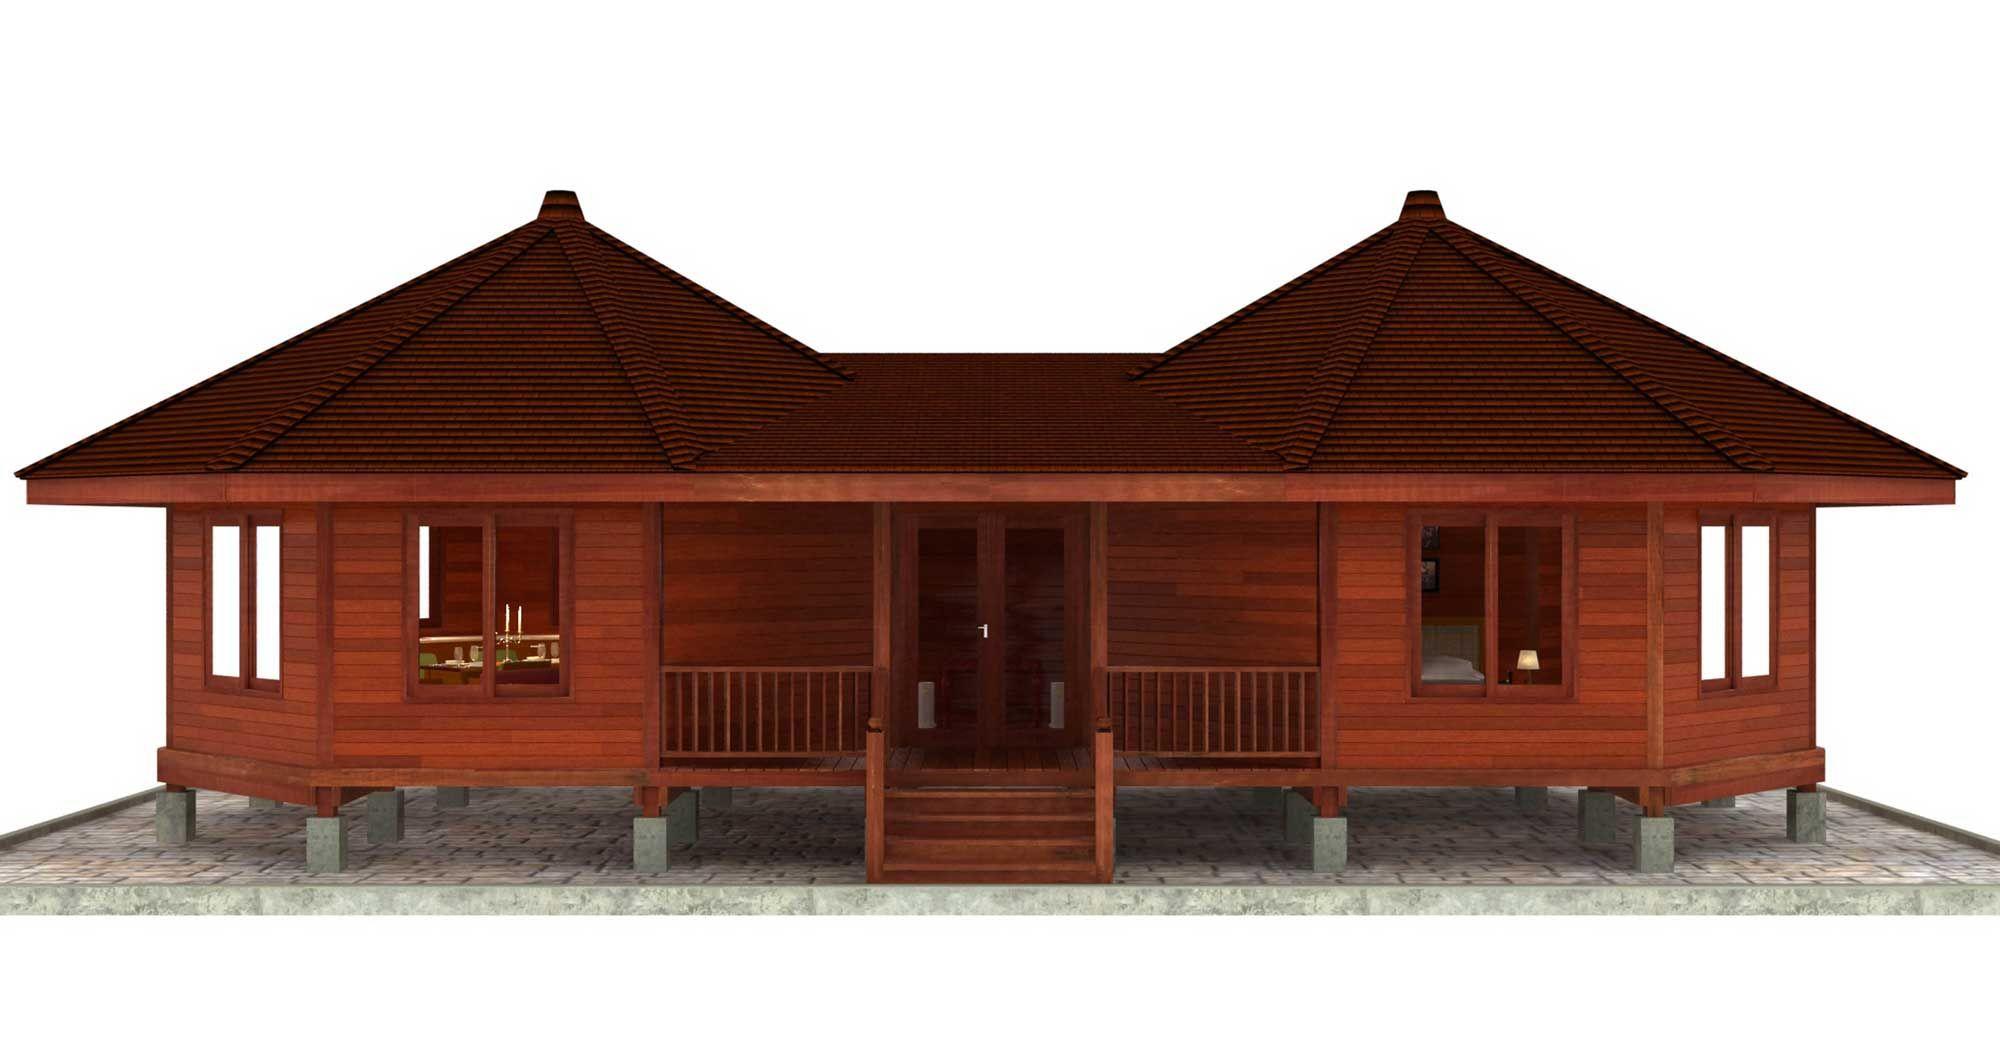 Octagonal Home Floor Plans Hana Hale Design Further Beach House Small Lot Octagon Bedrooms Octagon House Bali House House Design